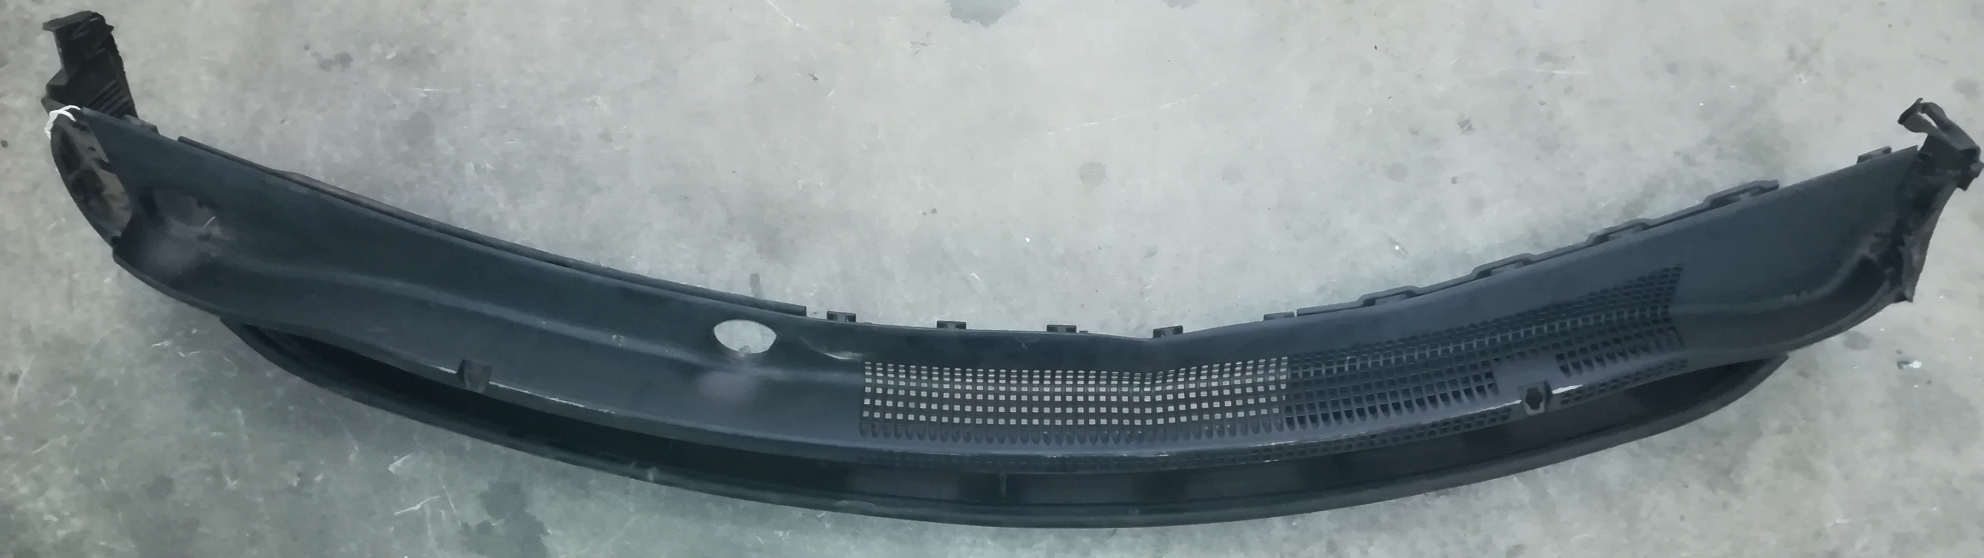 Hyundai I10 Grand '14 Wiper Cowlings for SALE!!